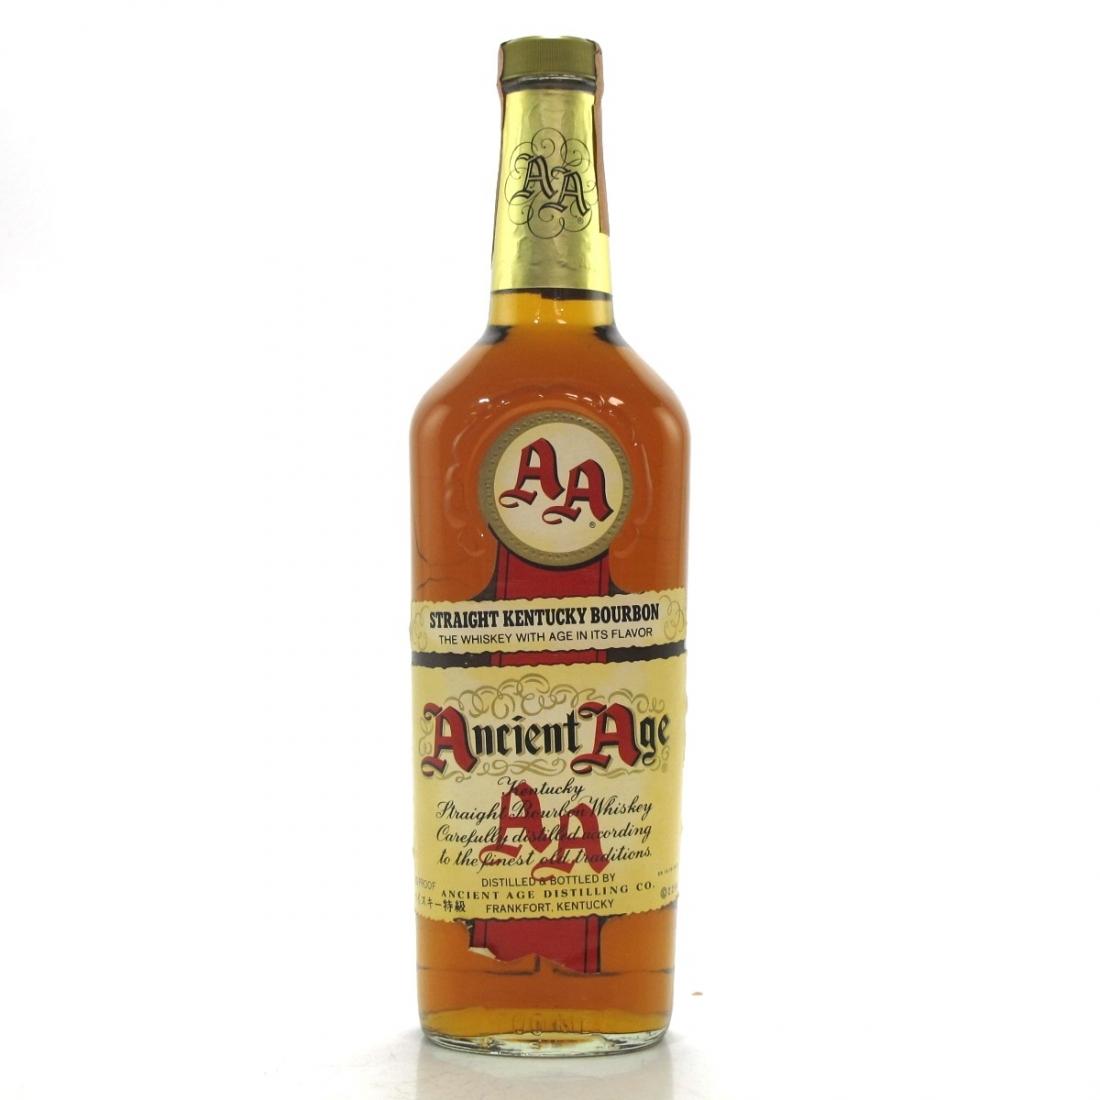 Ancient Age Kentucky Straight Bourbon 1980s